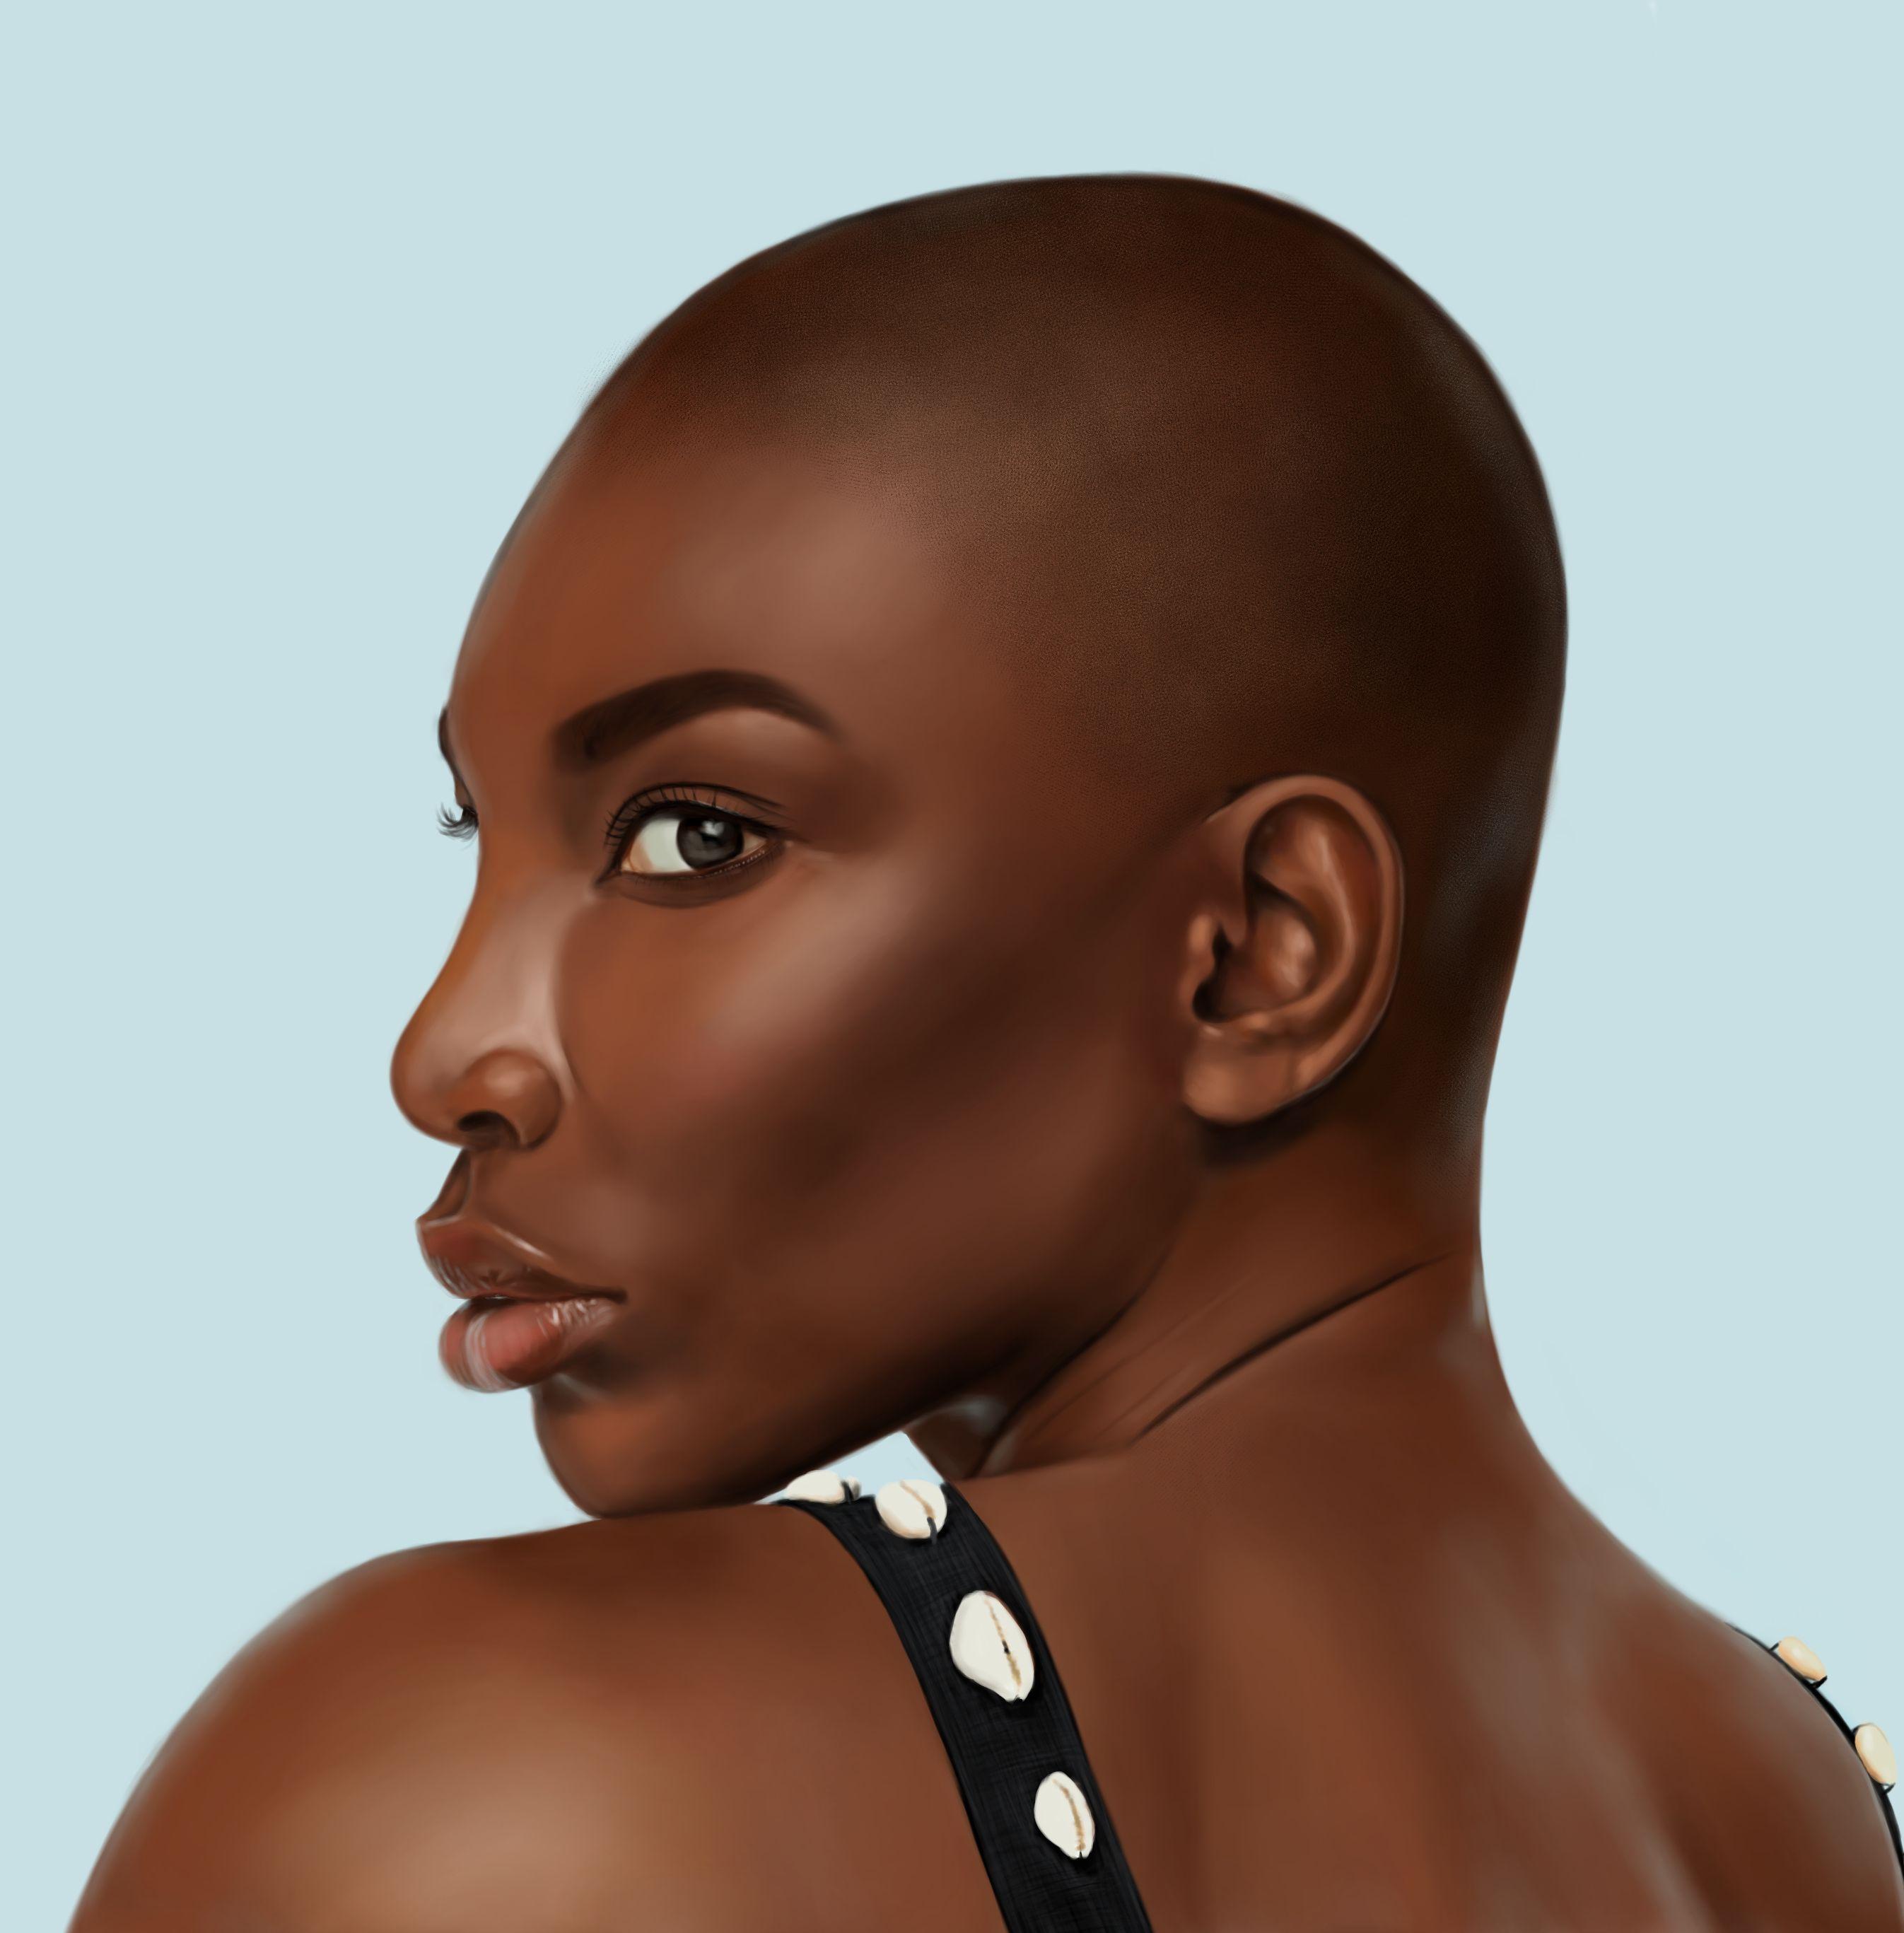 Michaela Coel digital portrait